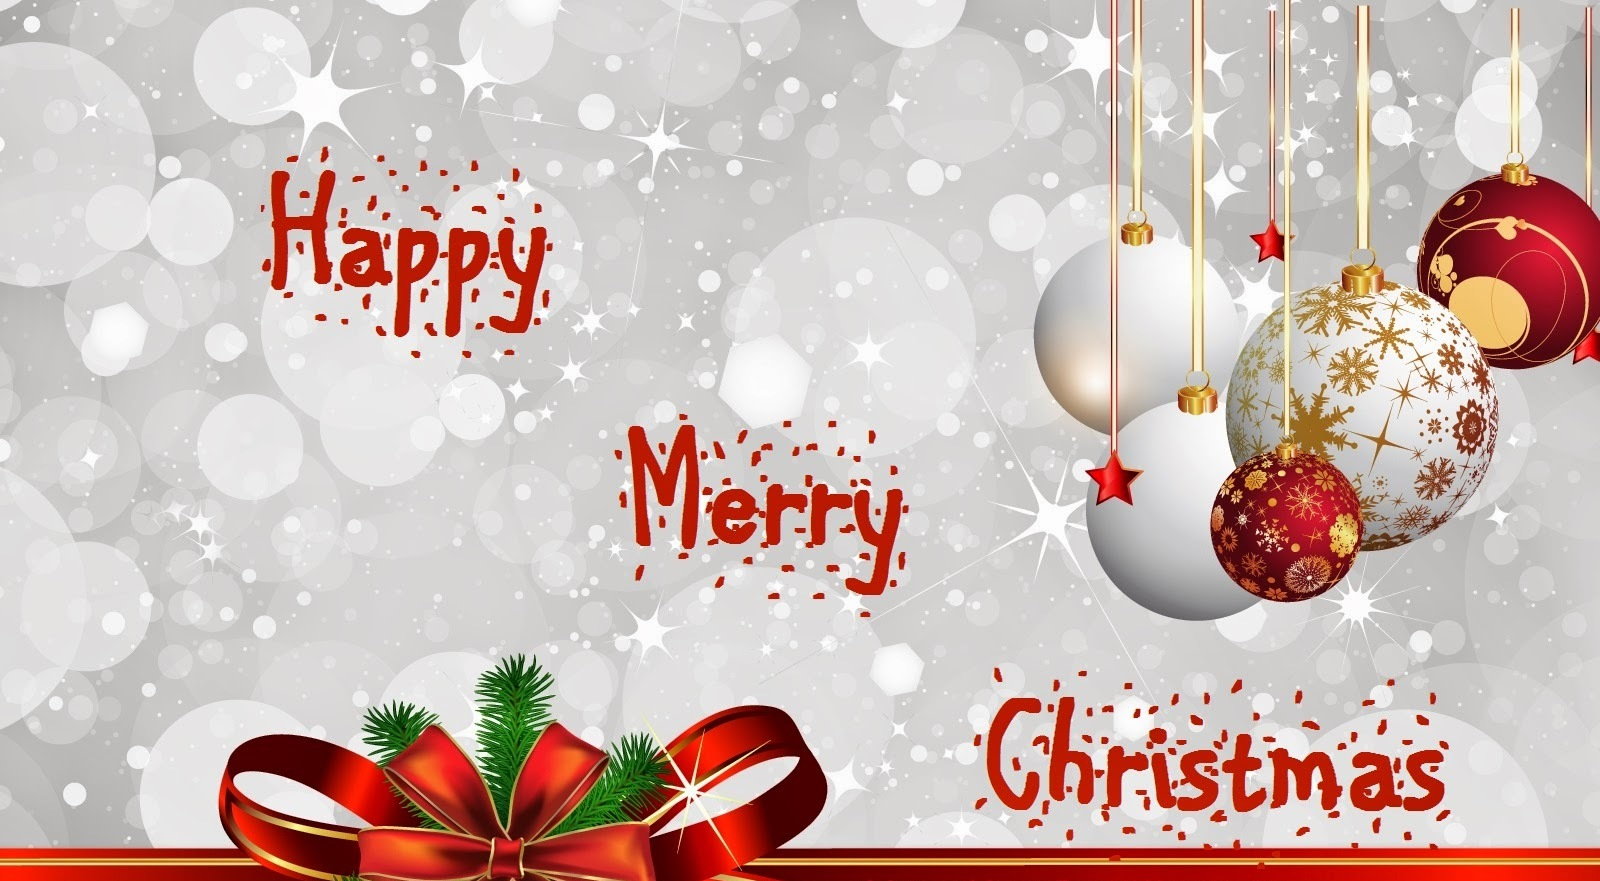 Happy Christmas Day 2017